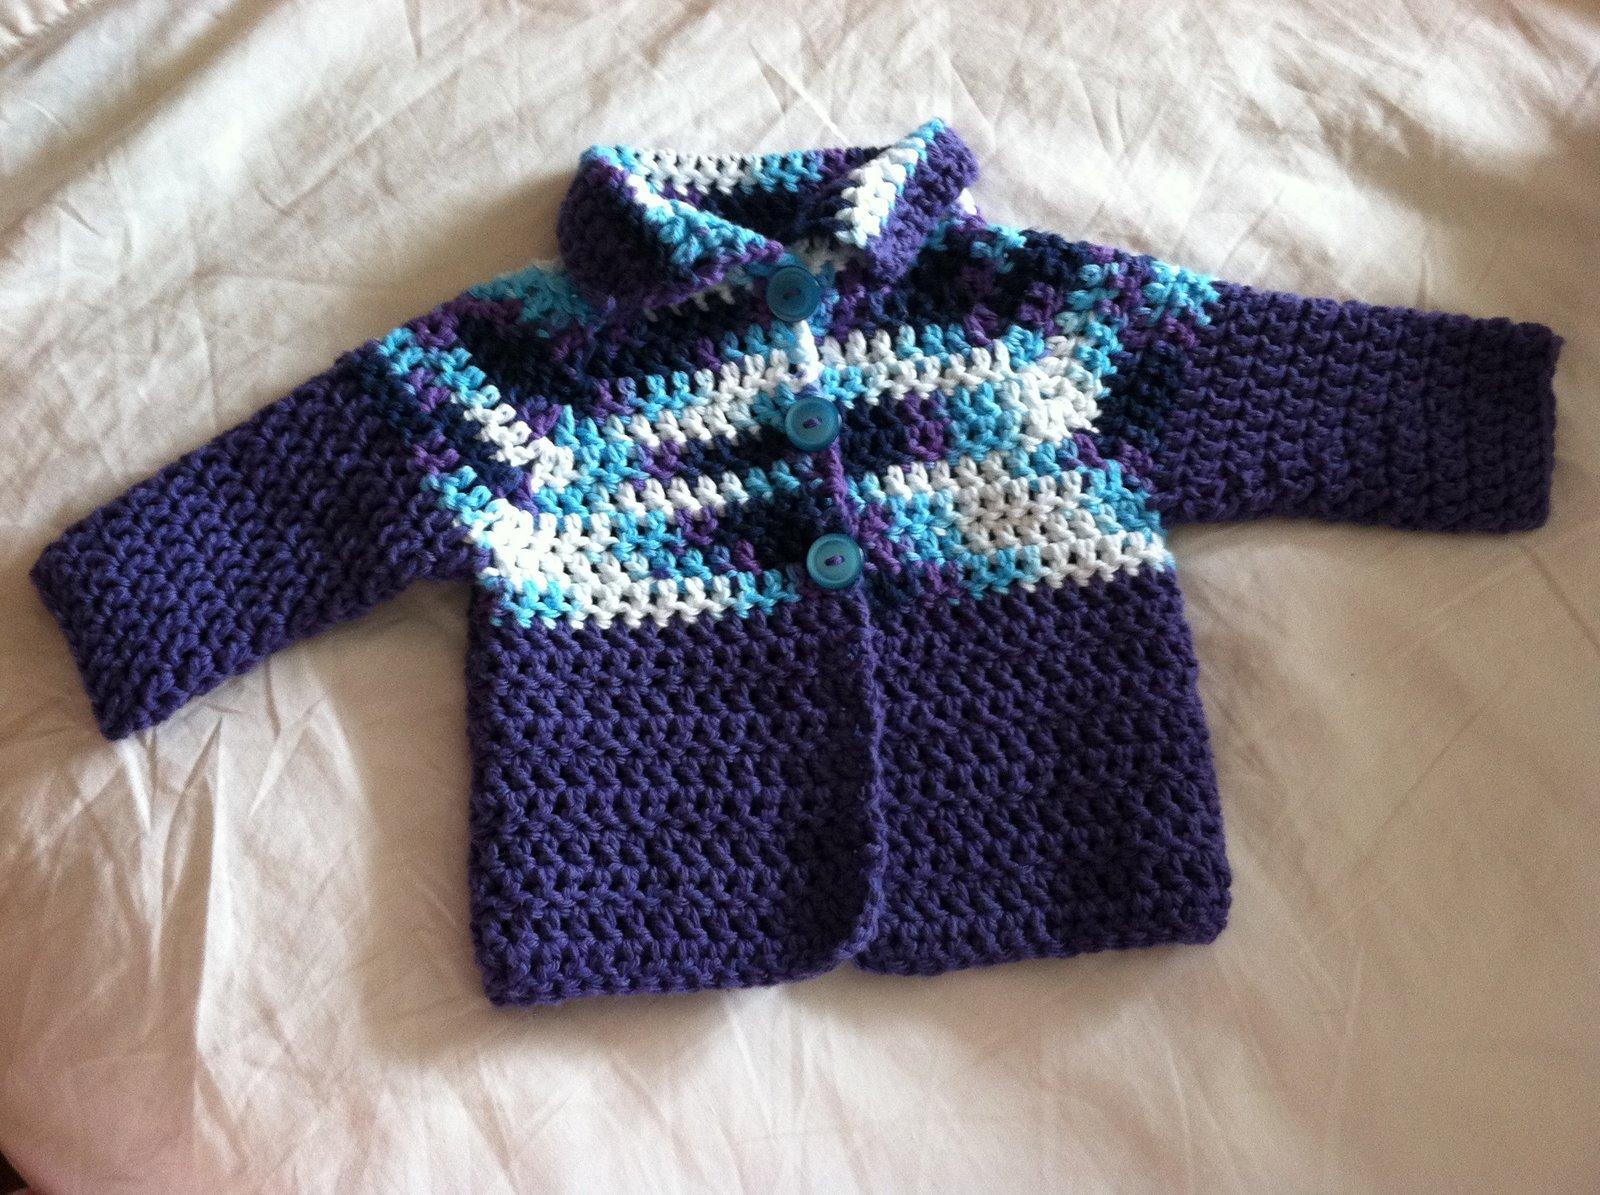 Cookin\' & Craftin\': Crocheted Baby Cardigan